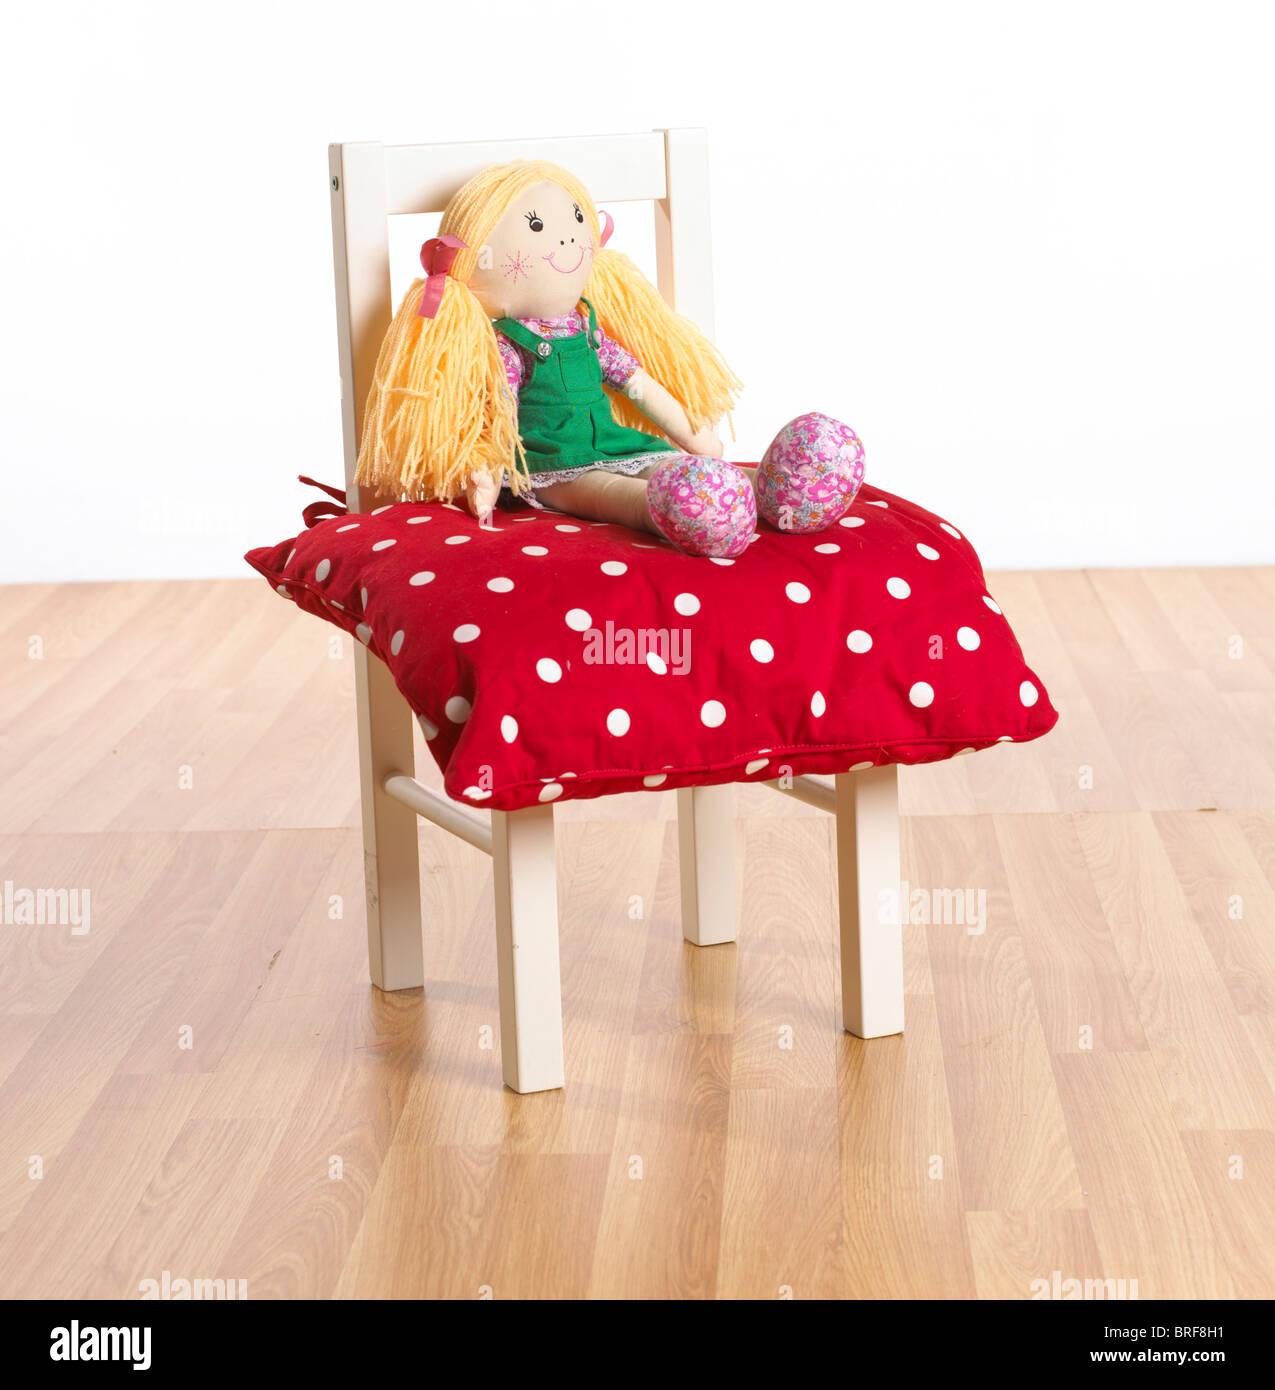 Rag Doll seduta su red polka dot cuscino sulla sedia bambino Immagini Stock